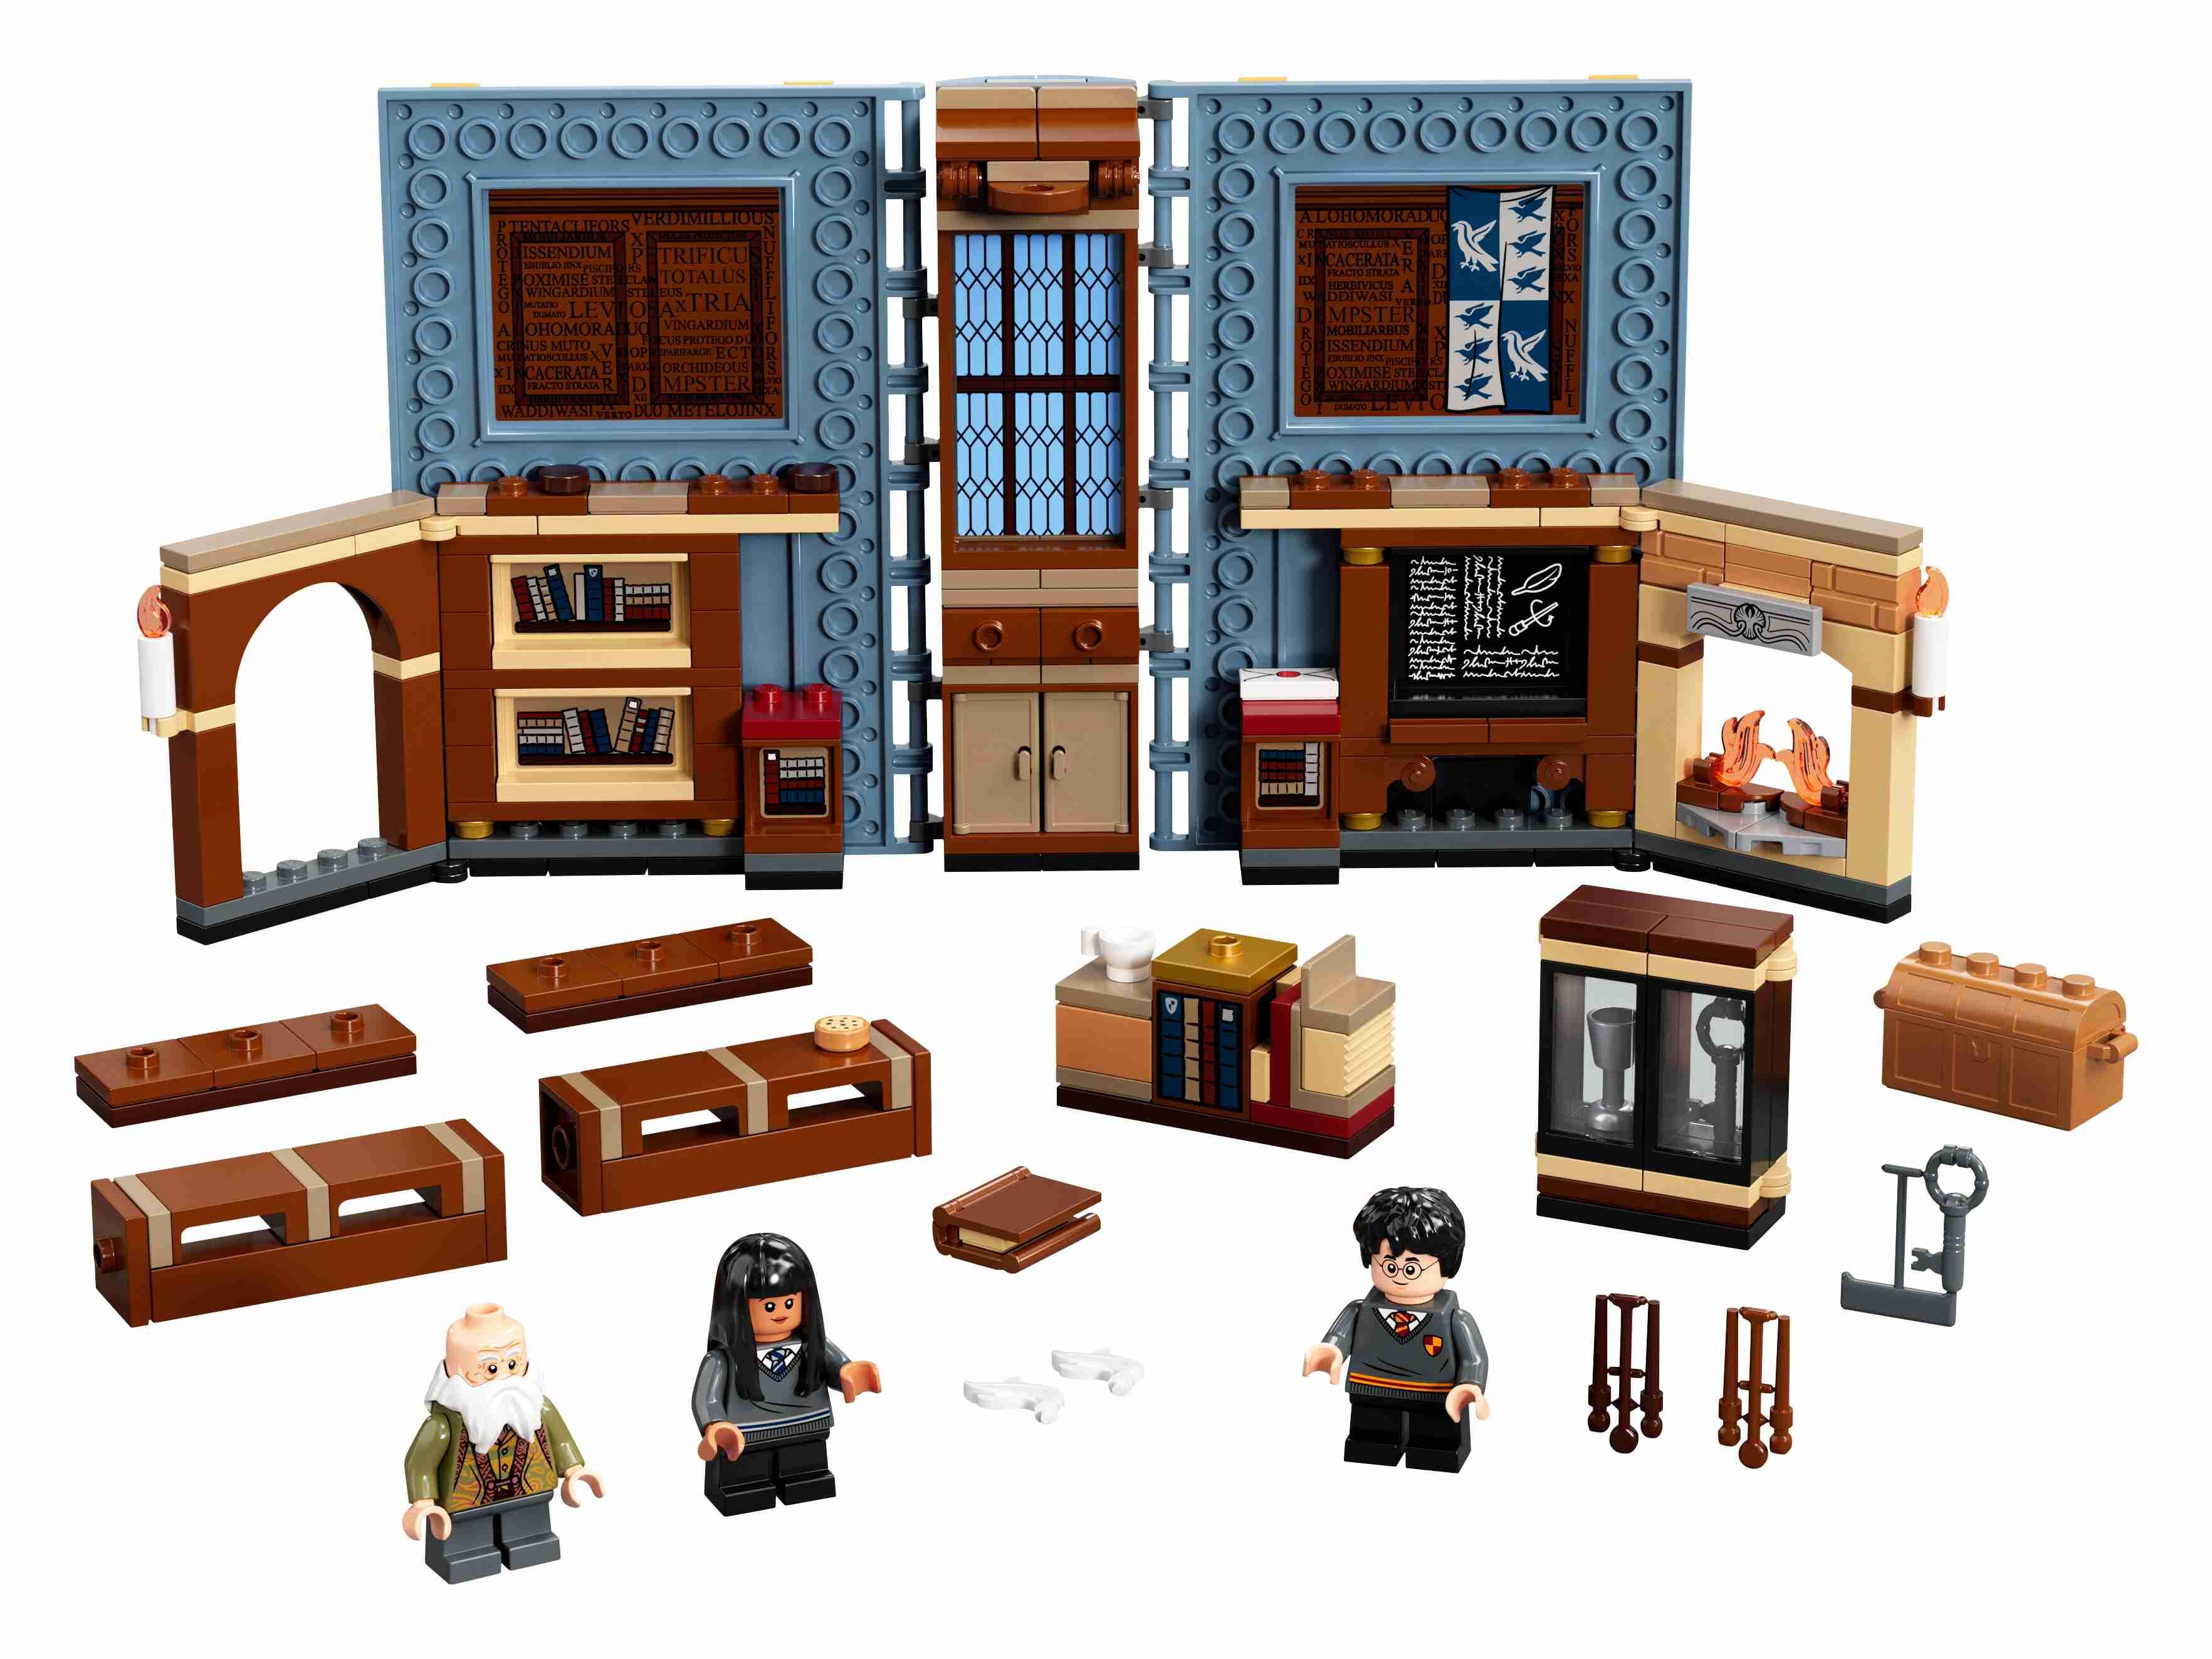 LEGO76385HarryPotterHogwartsMoment:ZauberkunstunterrichtSet + Minifiguren